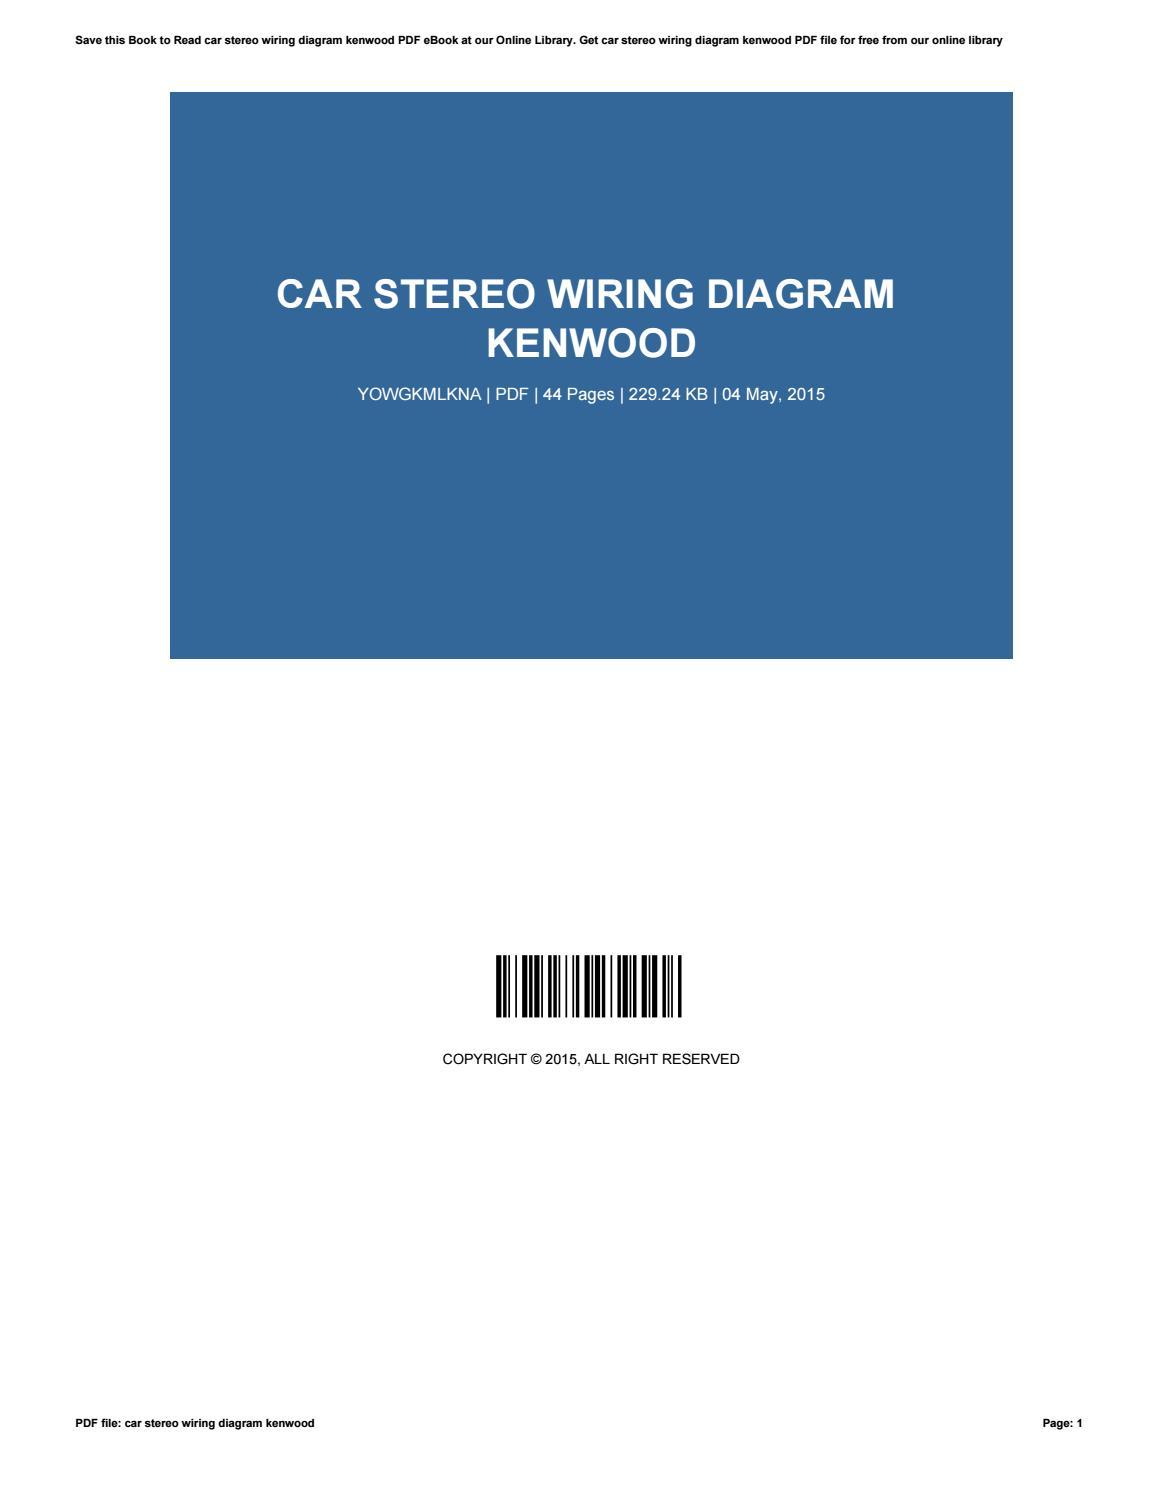 Kenwood Radio Wiring Diagram Ajilbab Com Portal